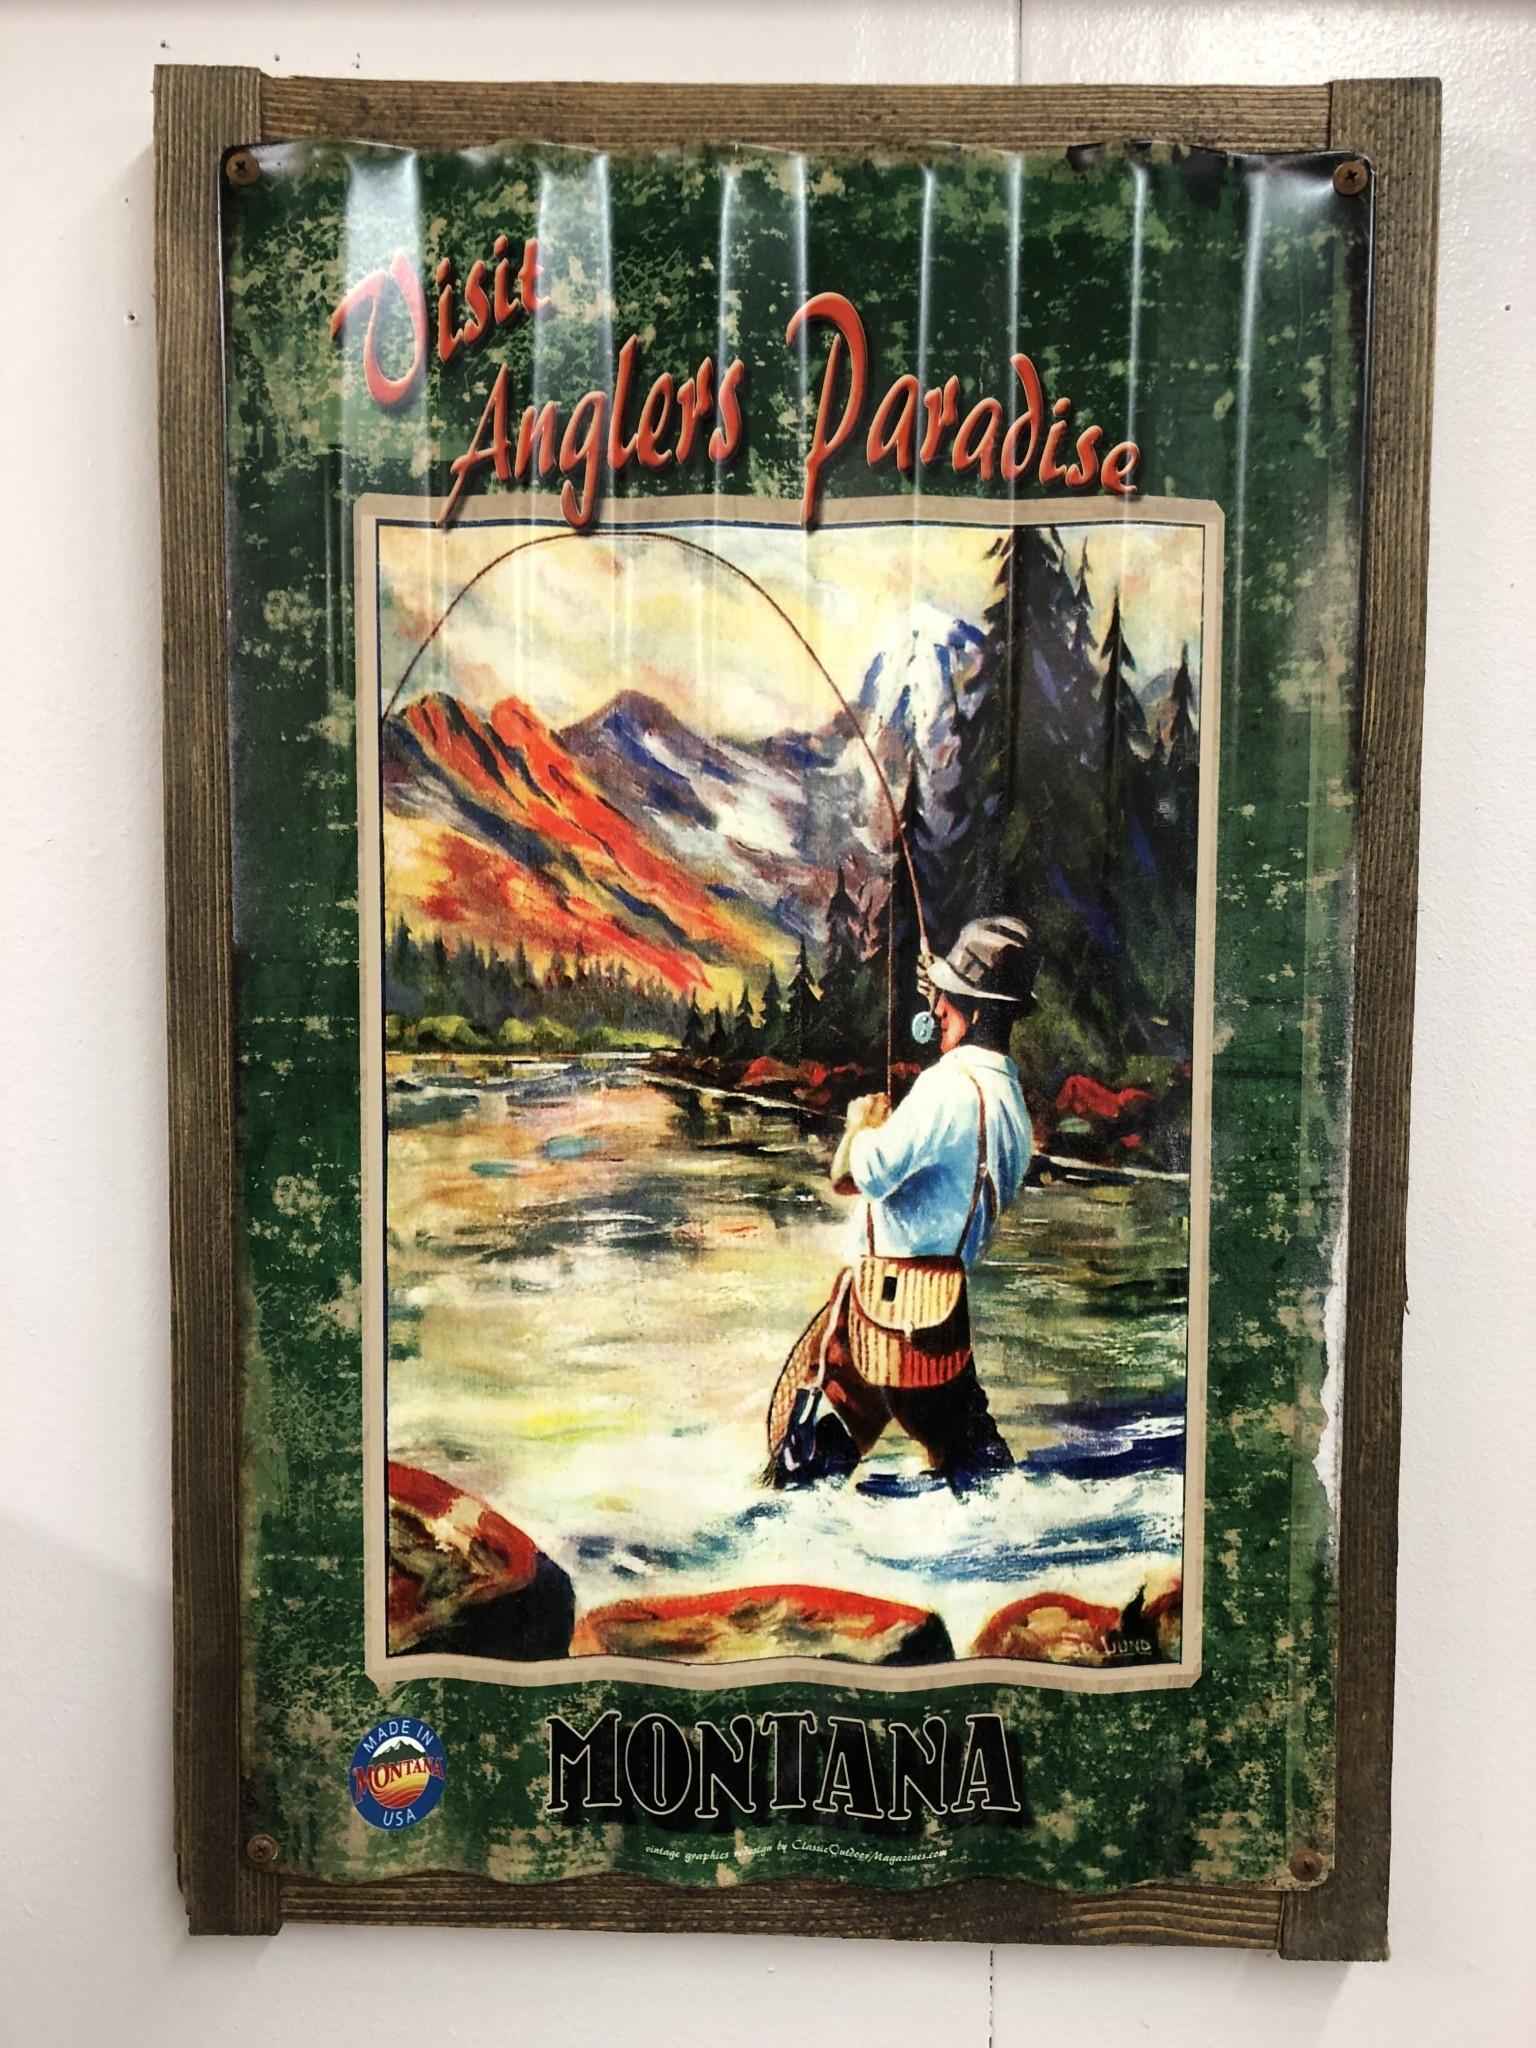 Classic Outdoor Magazines #3  Angler Paradise Corrugated 17x24